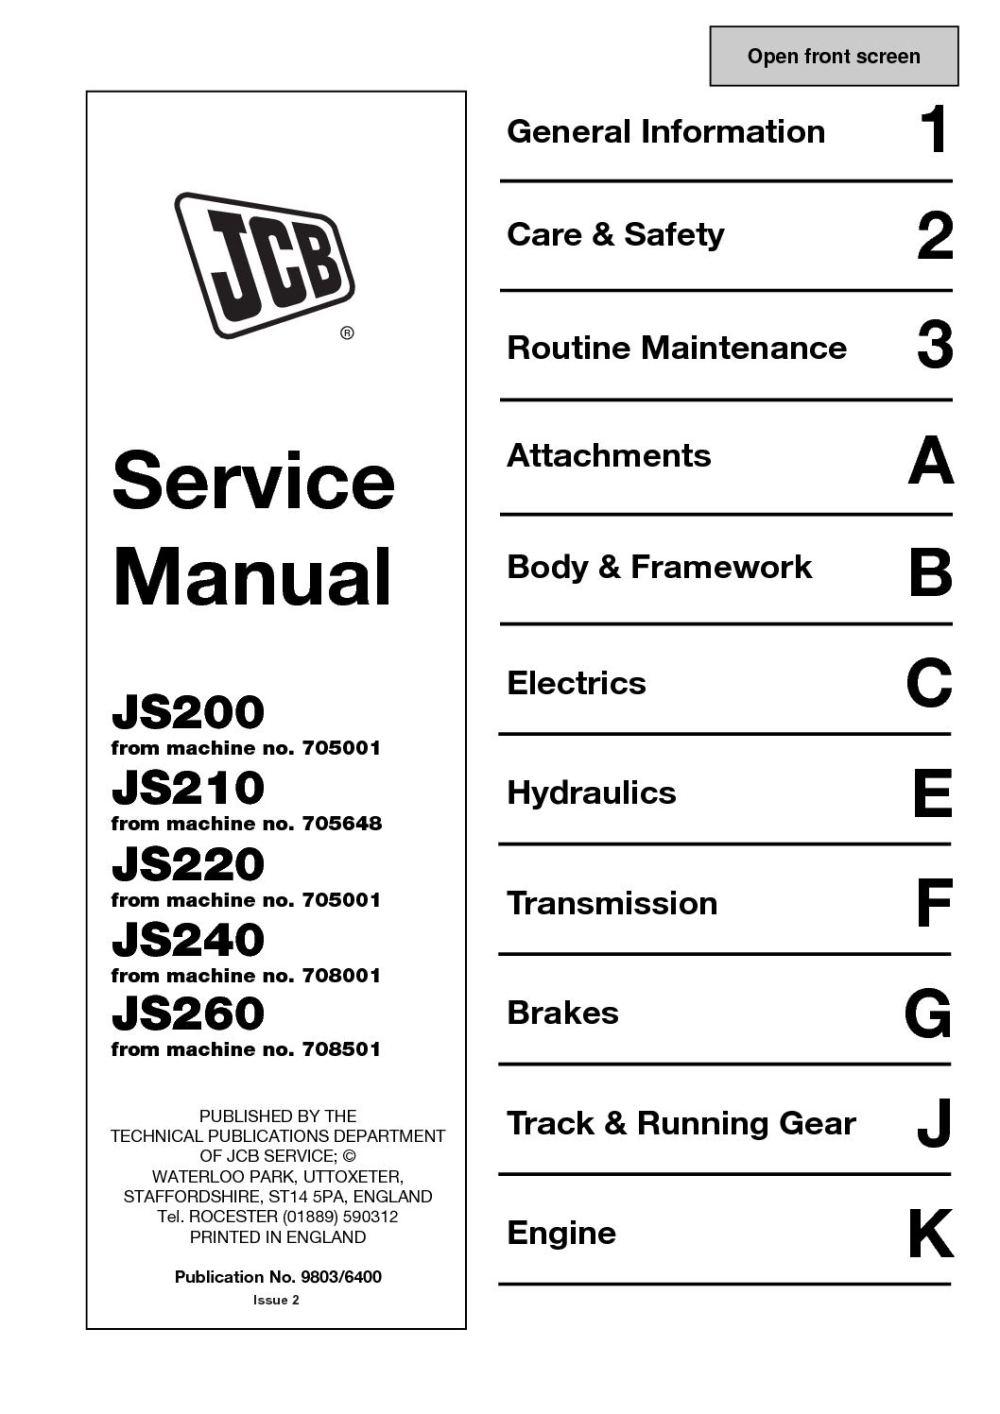 medium resolution of jcb js220 tracked excavator service repair manual sn 705001 onwards